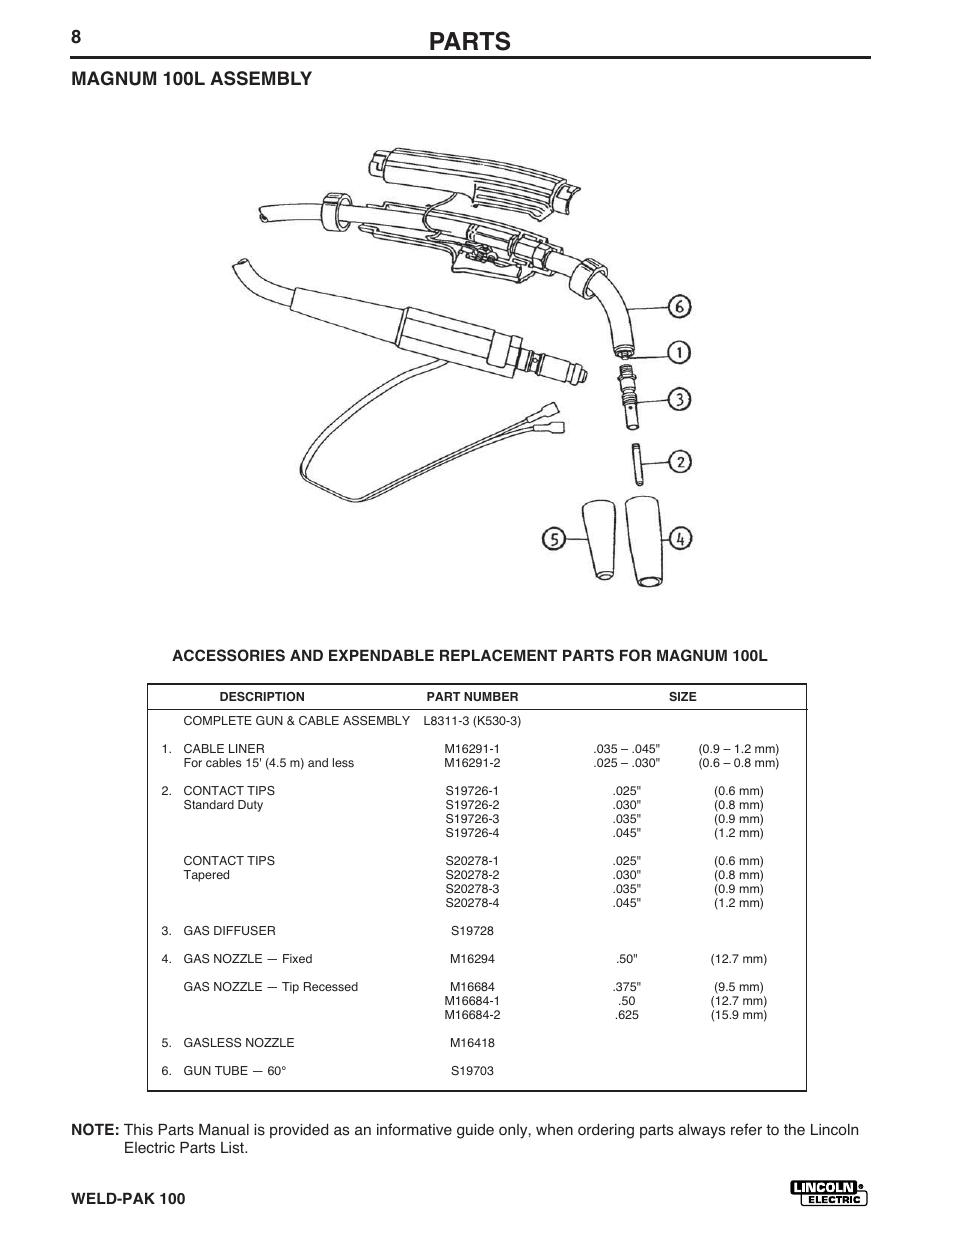 lincoln ranger 8 welder wiring diagram 1999 f150 100 parts diagram. lincoln. auto